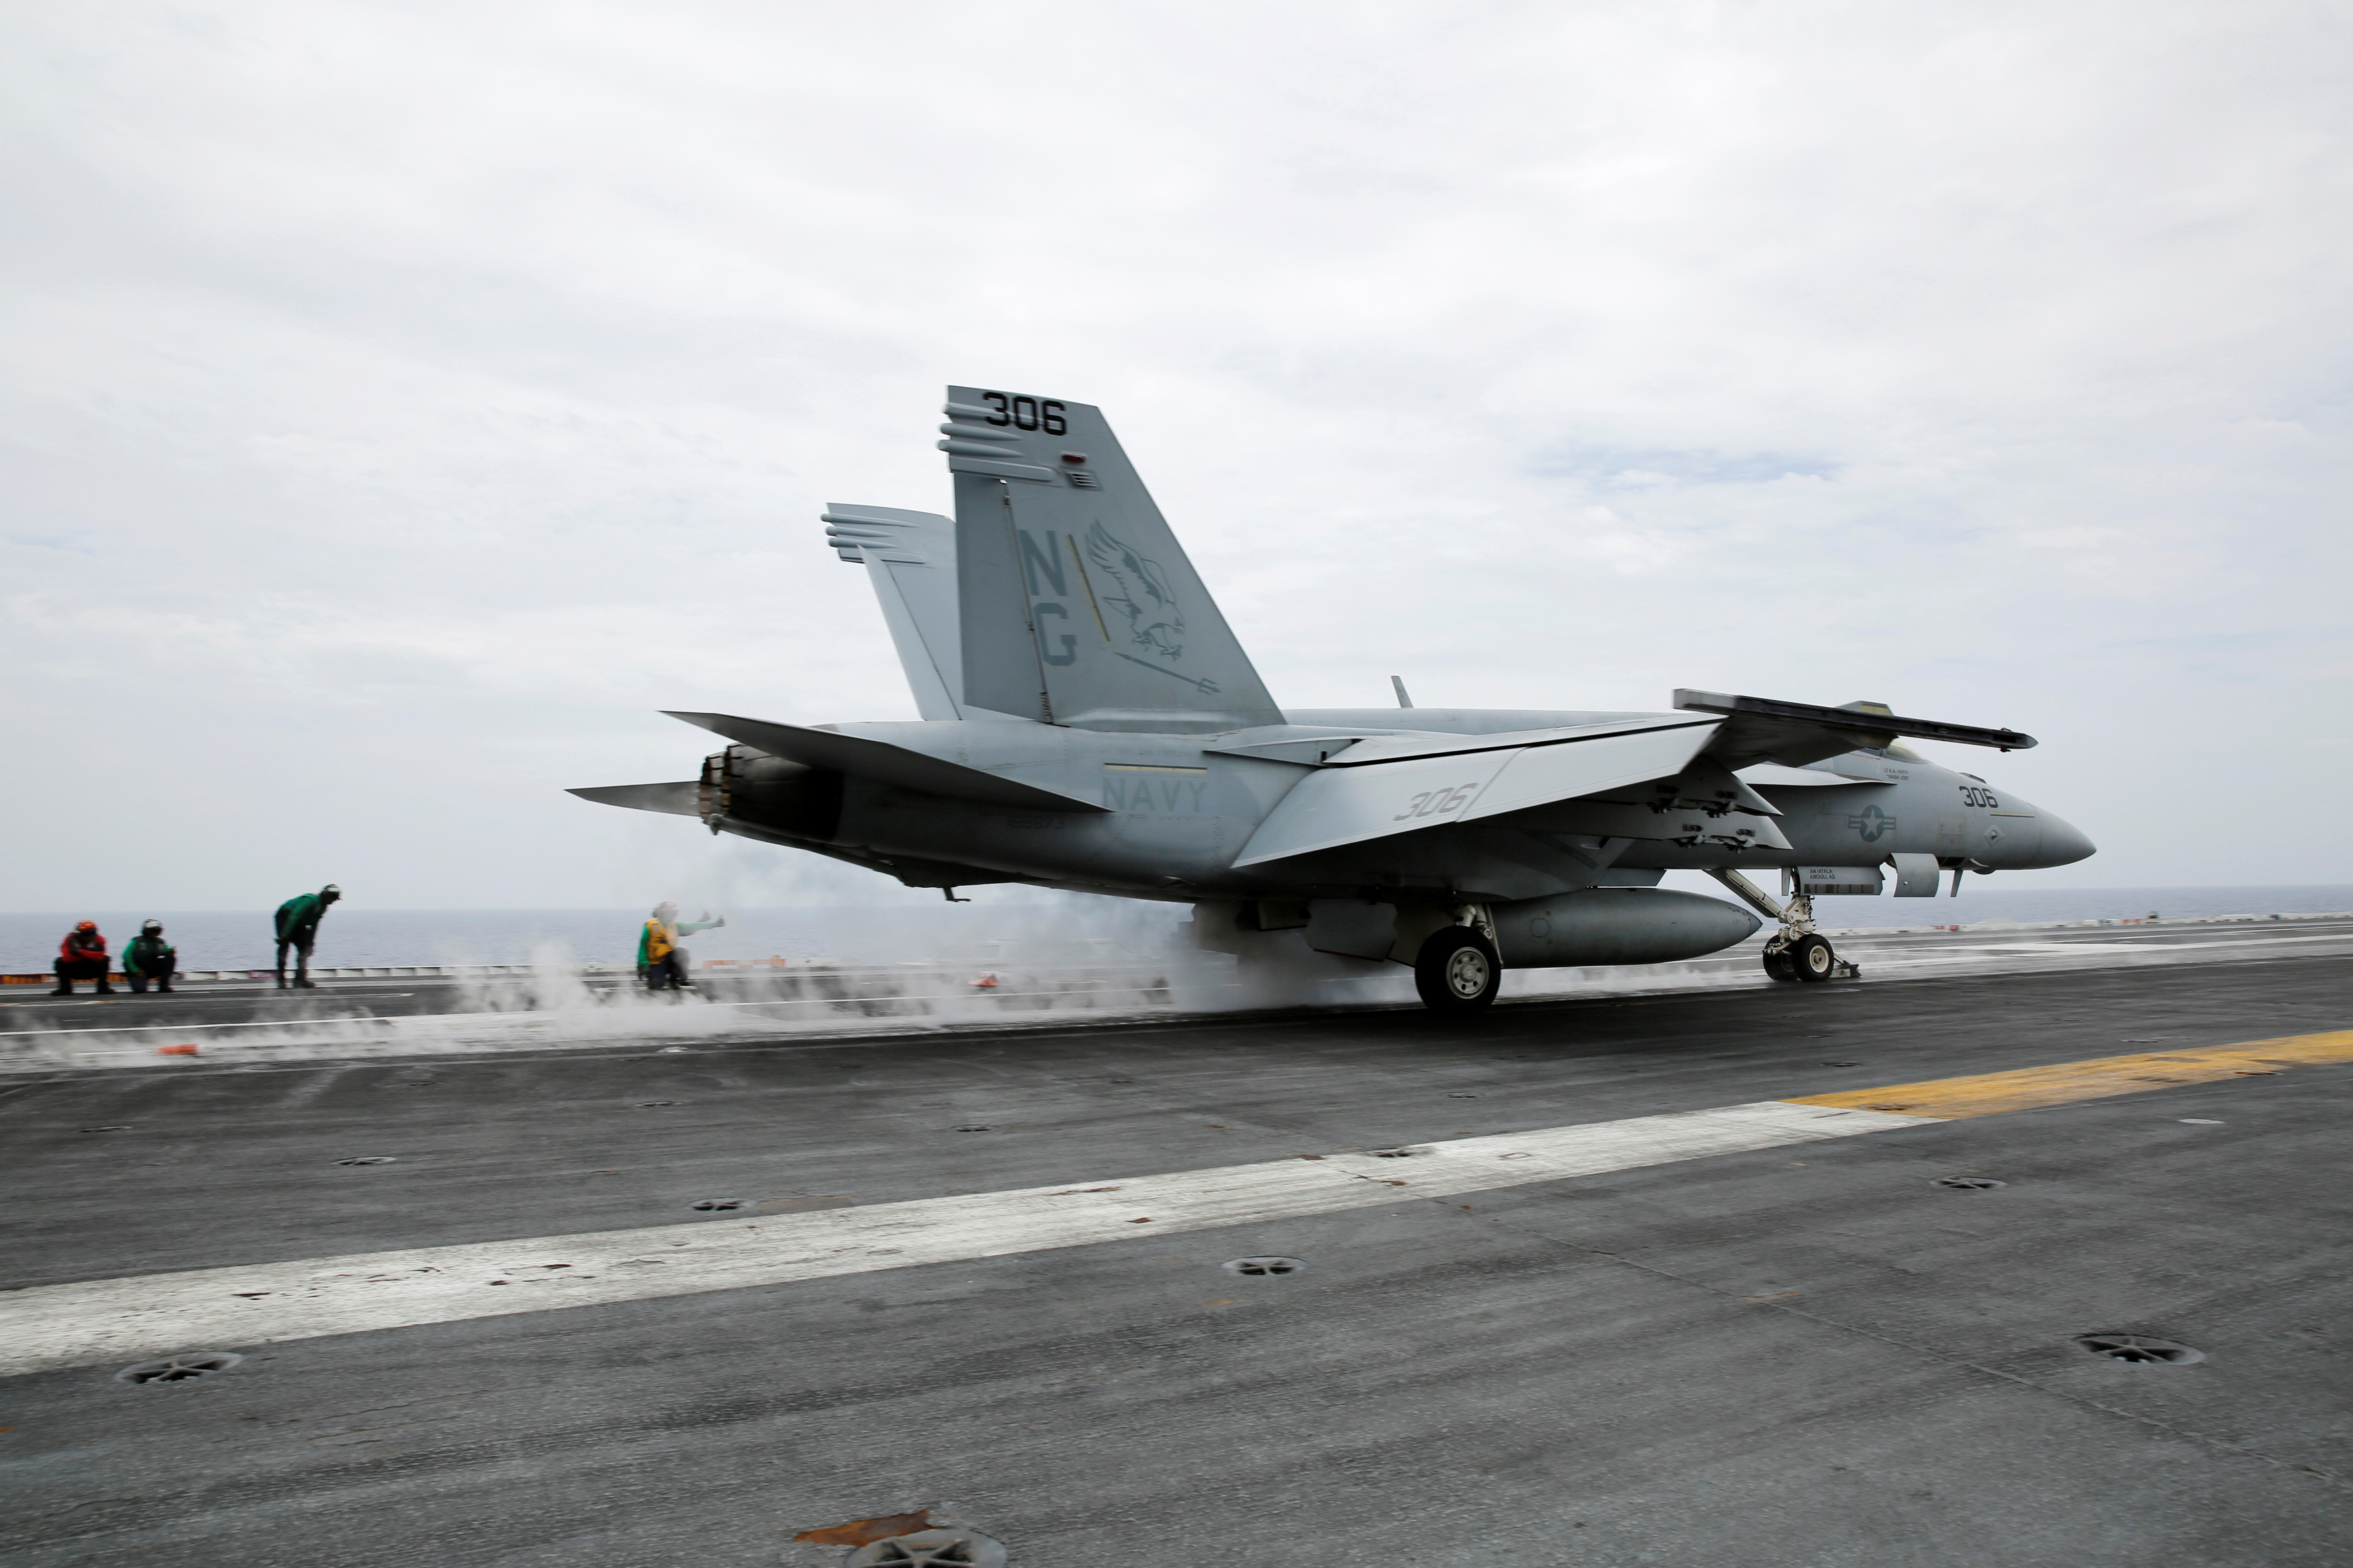 With eye on China, India invites Australia for military exercises